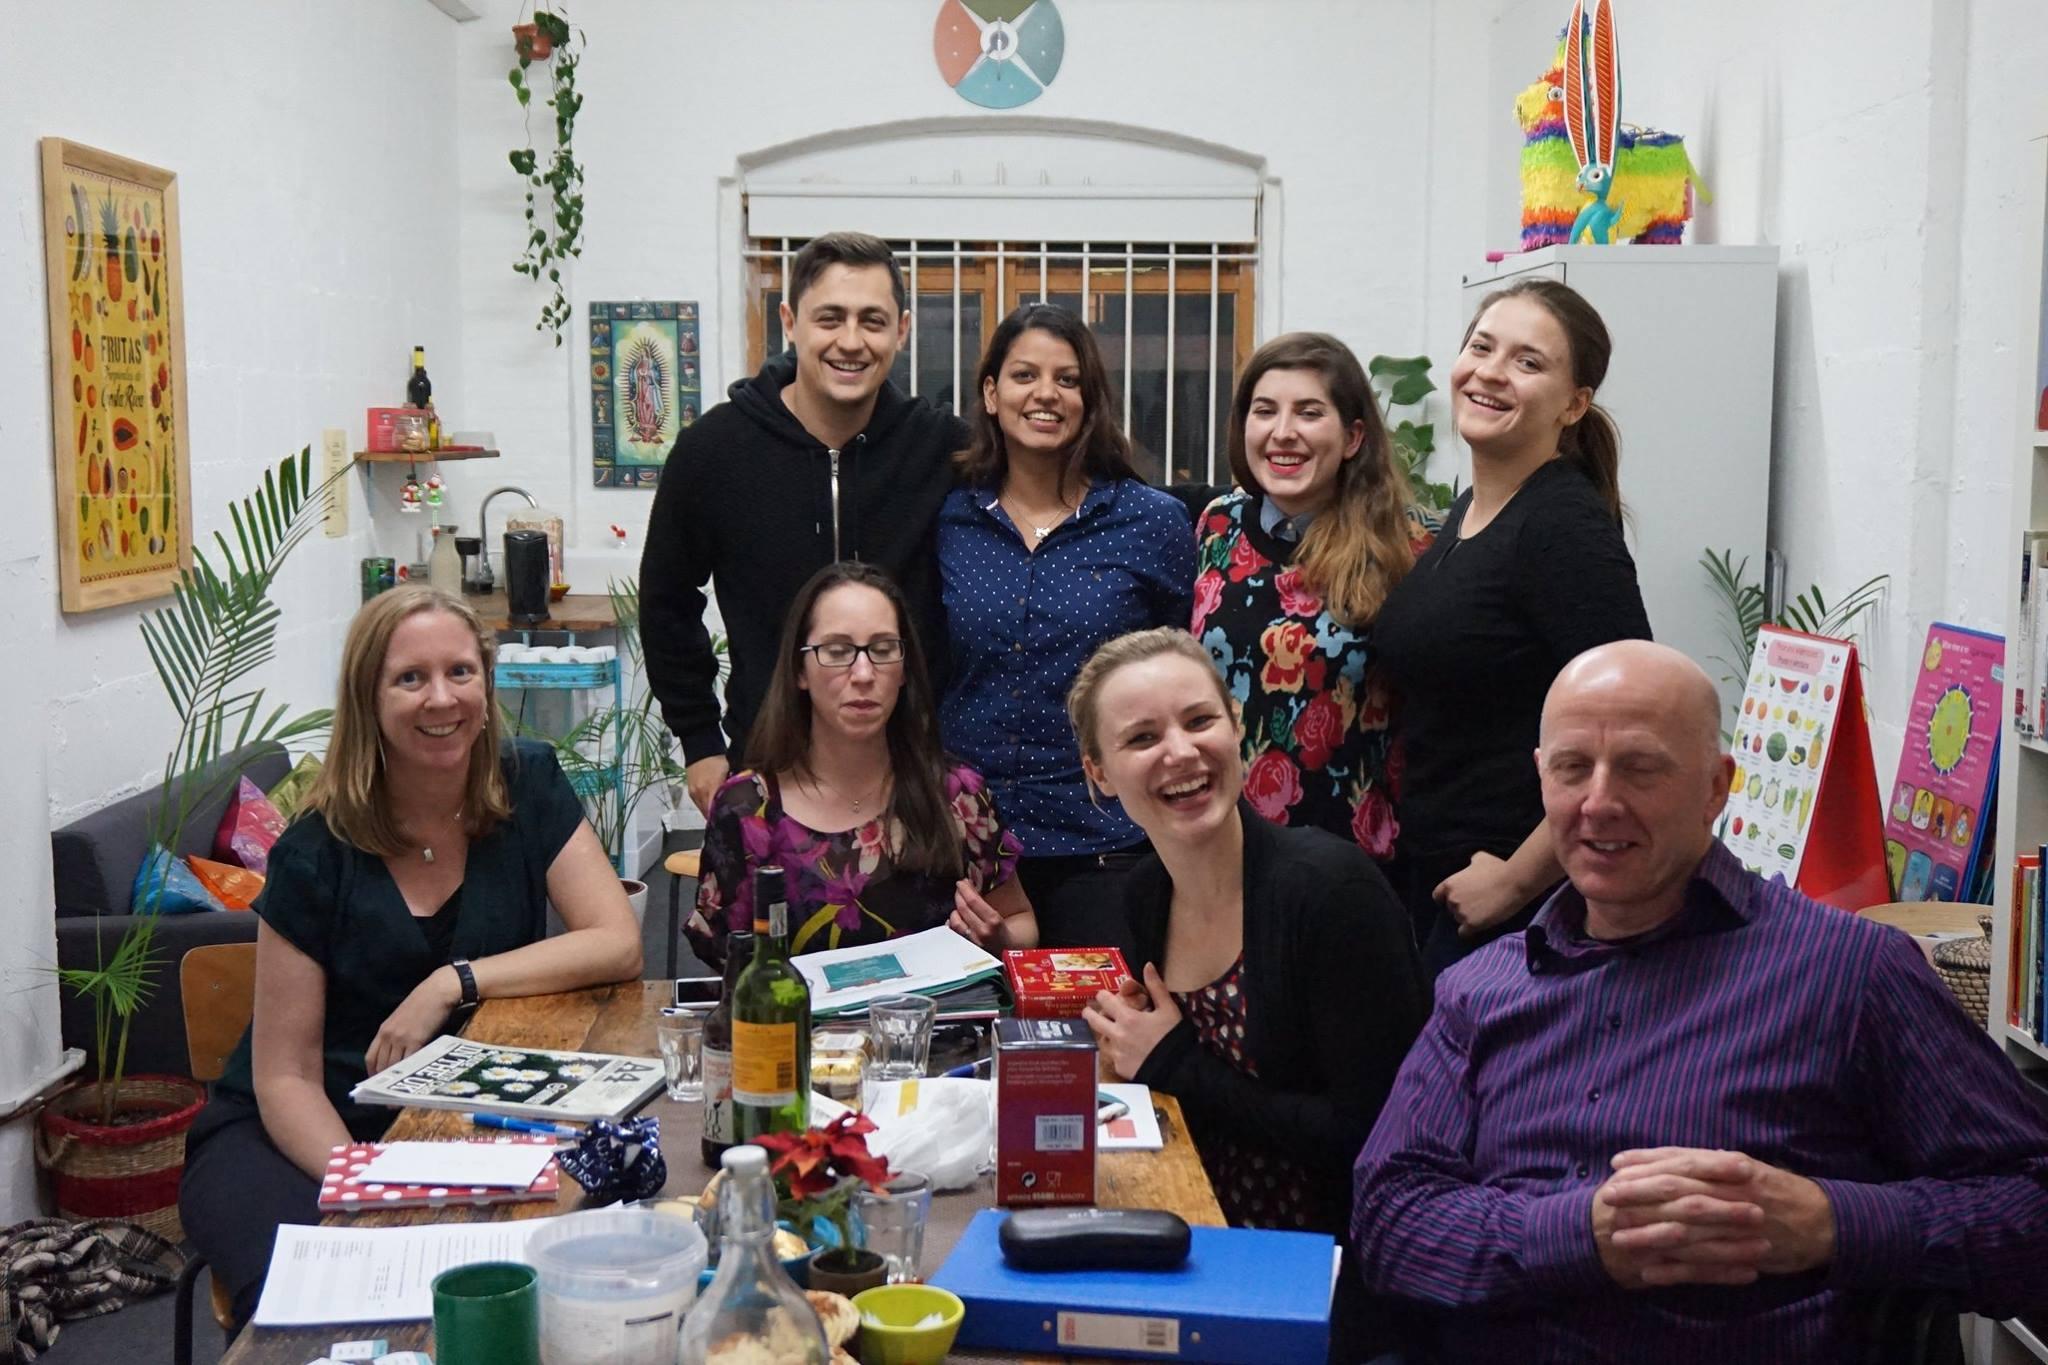 Battersea Spanish class celebrates graduation day